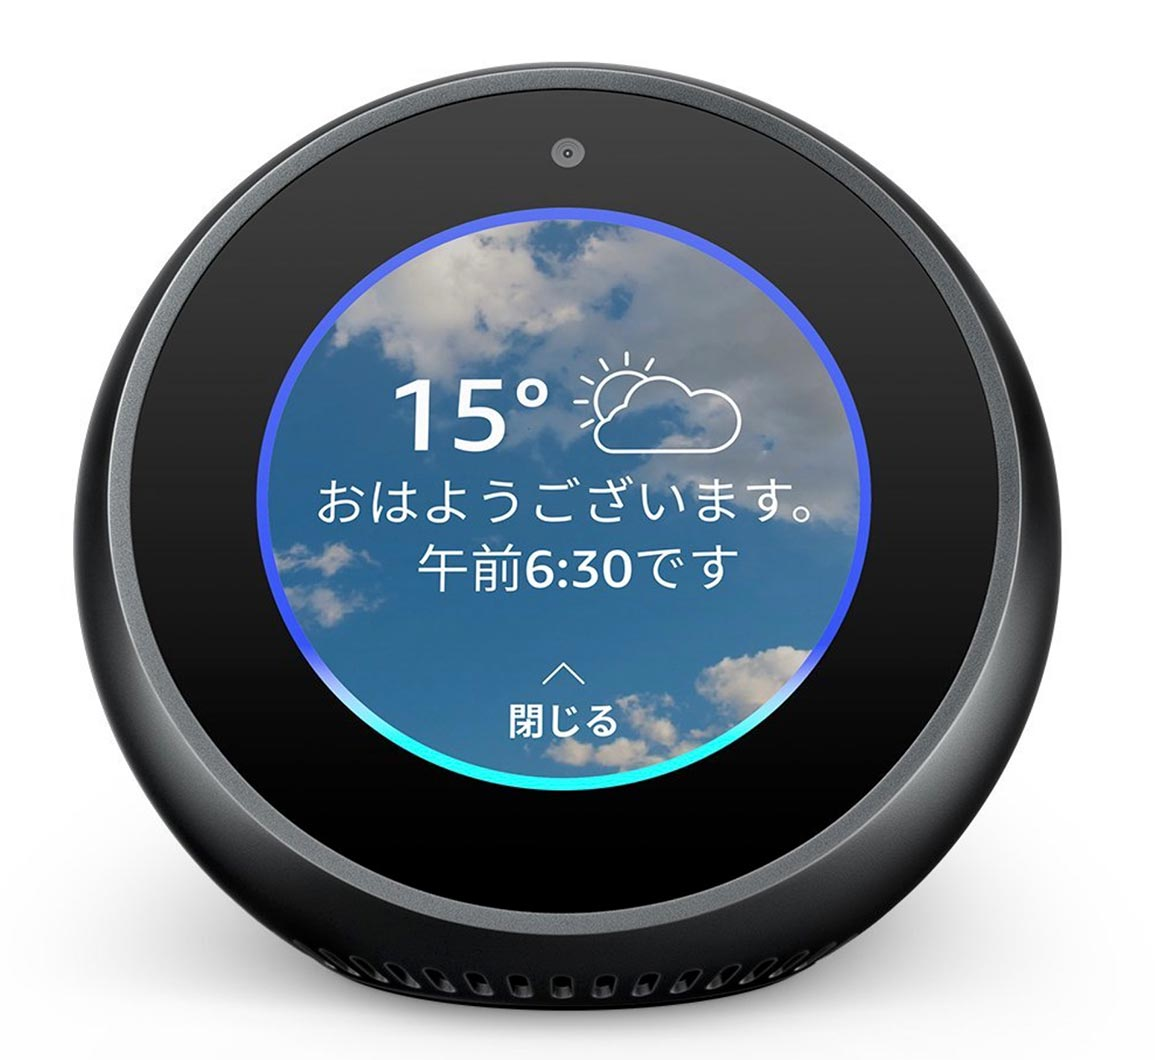 Amazon、円形スクリーン付きAlexa搭載スマートスピーカー「Amazon Echo Spot」の販売を開始